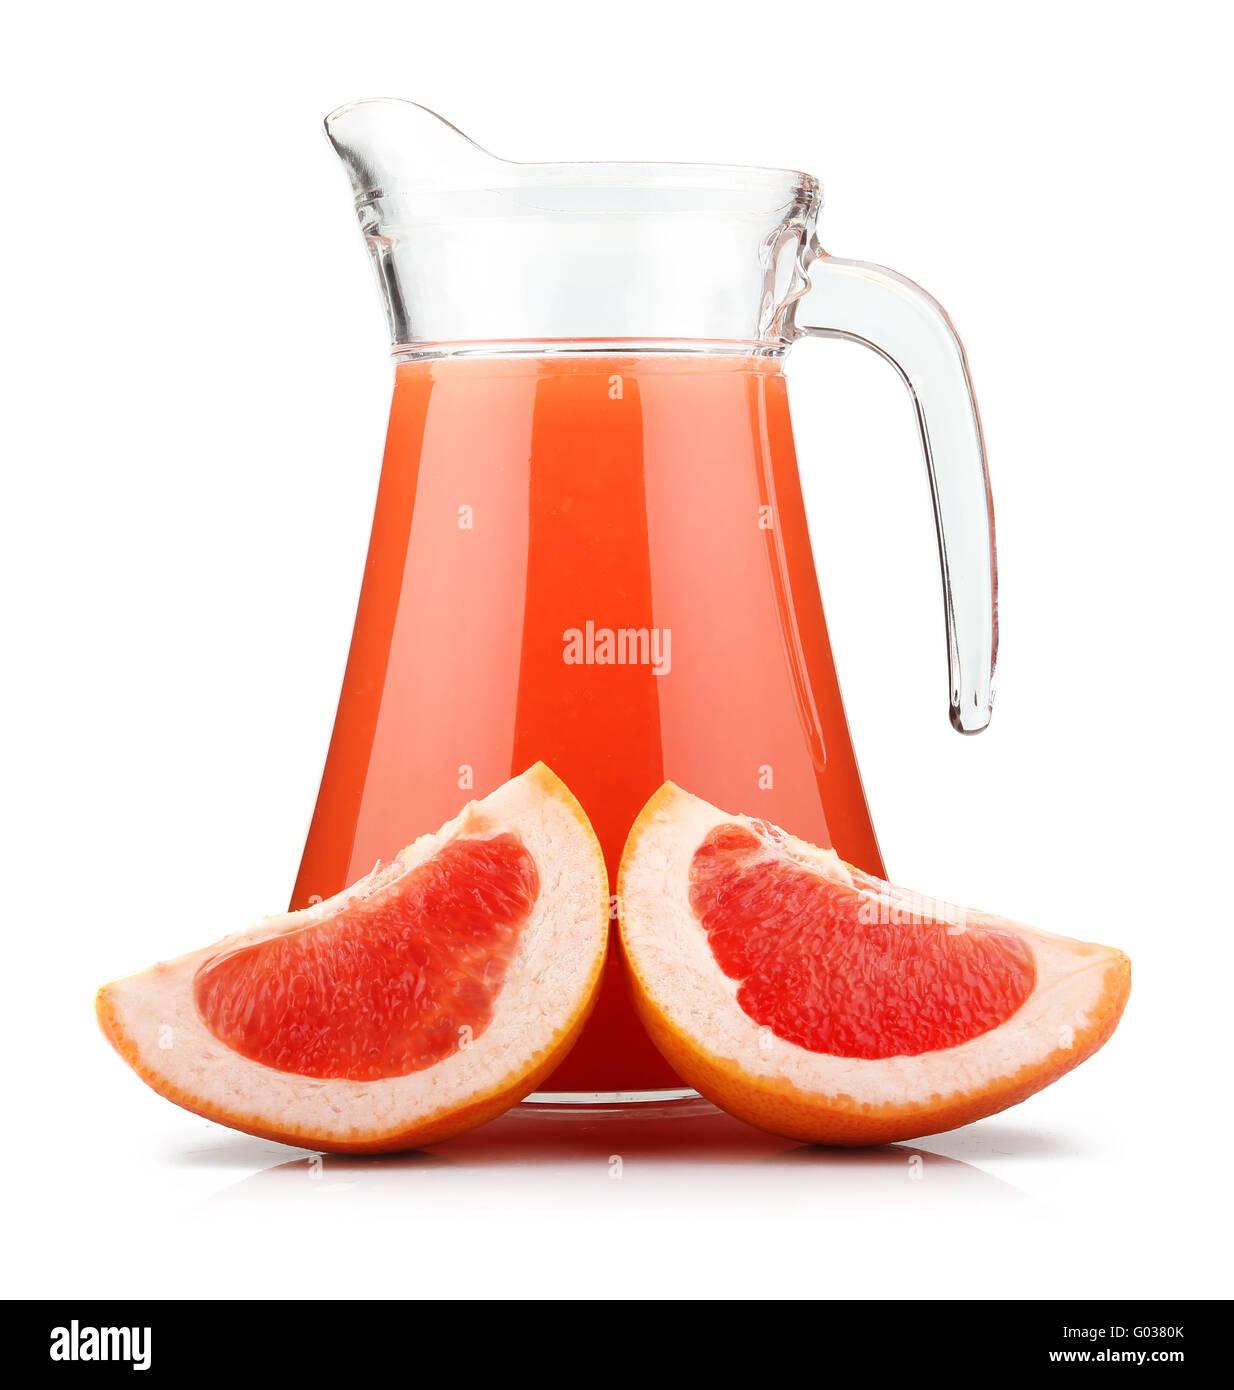 Full jug of grapefruit juice and fruits isolated - Stock Image